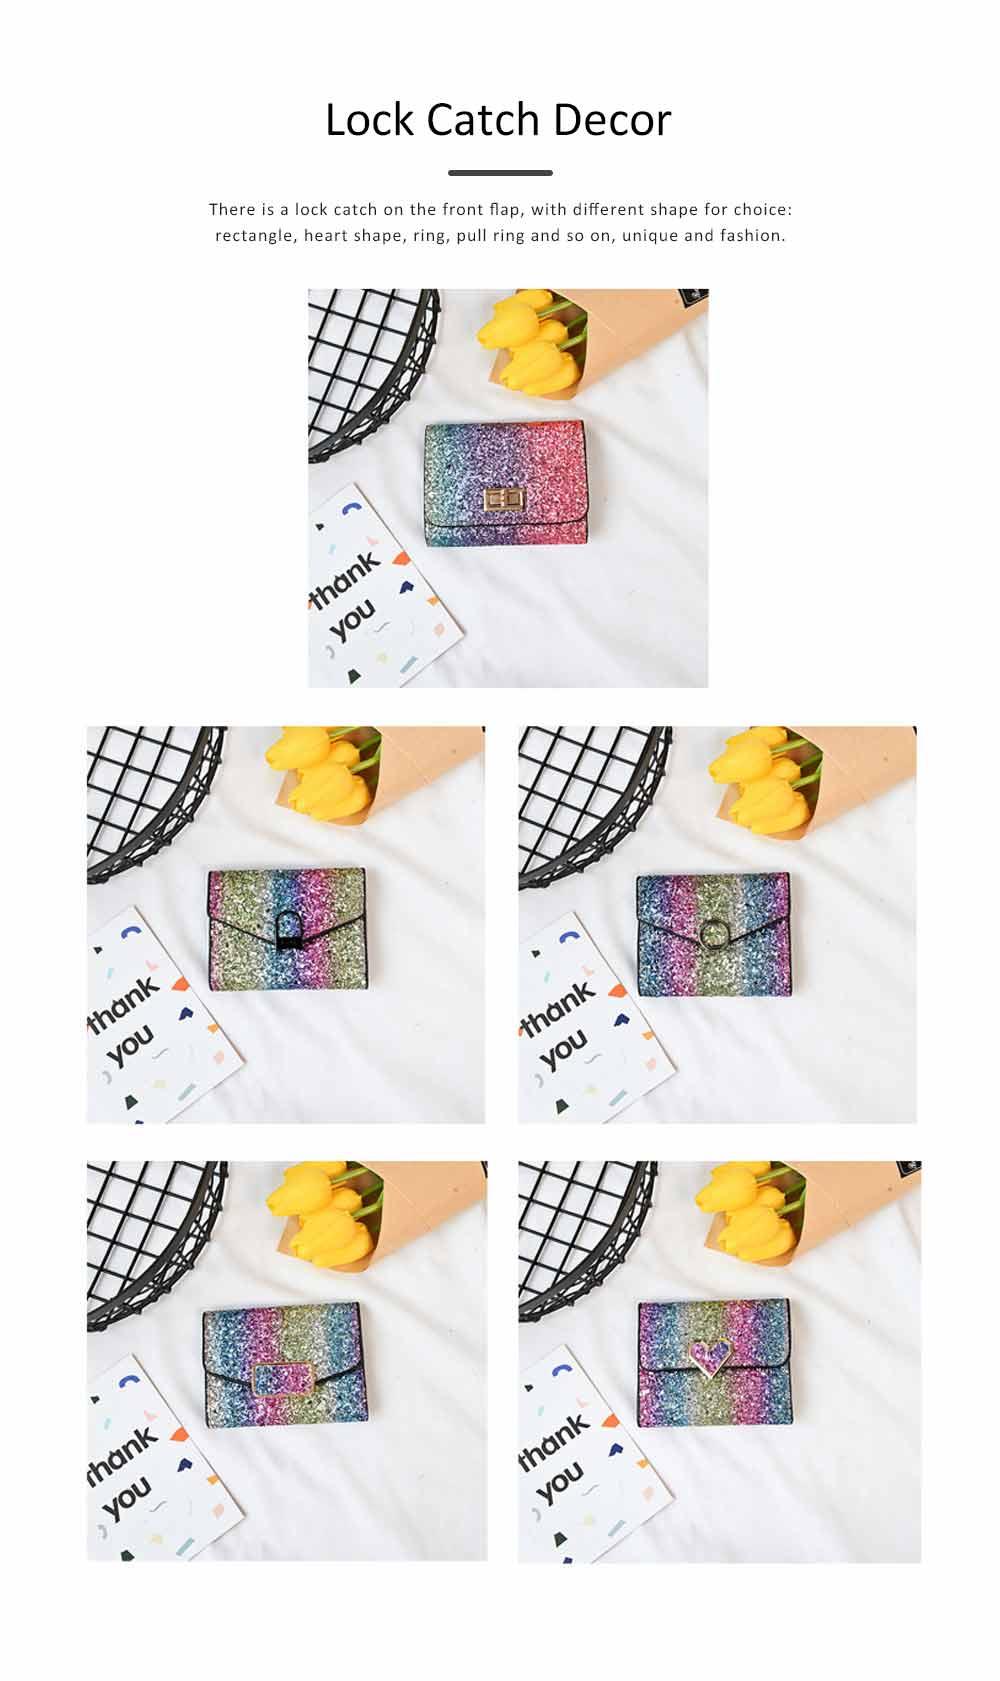 Chic Short Purse Folio Mini Handbag Sequins Colorful 3 Slots PU Leather Rainbow Clutch Bag Evening Party Accessories 3